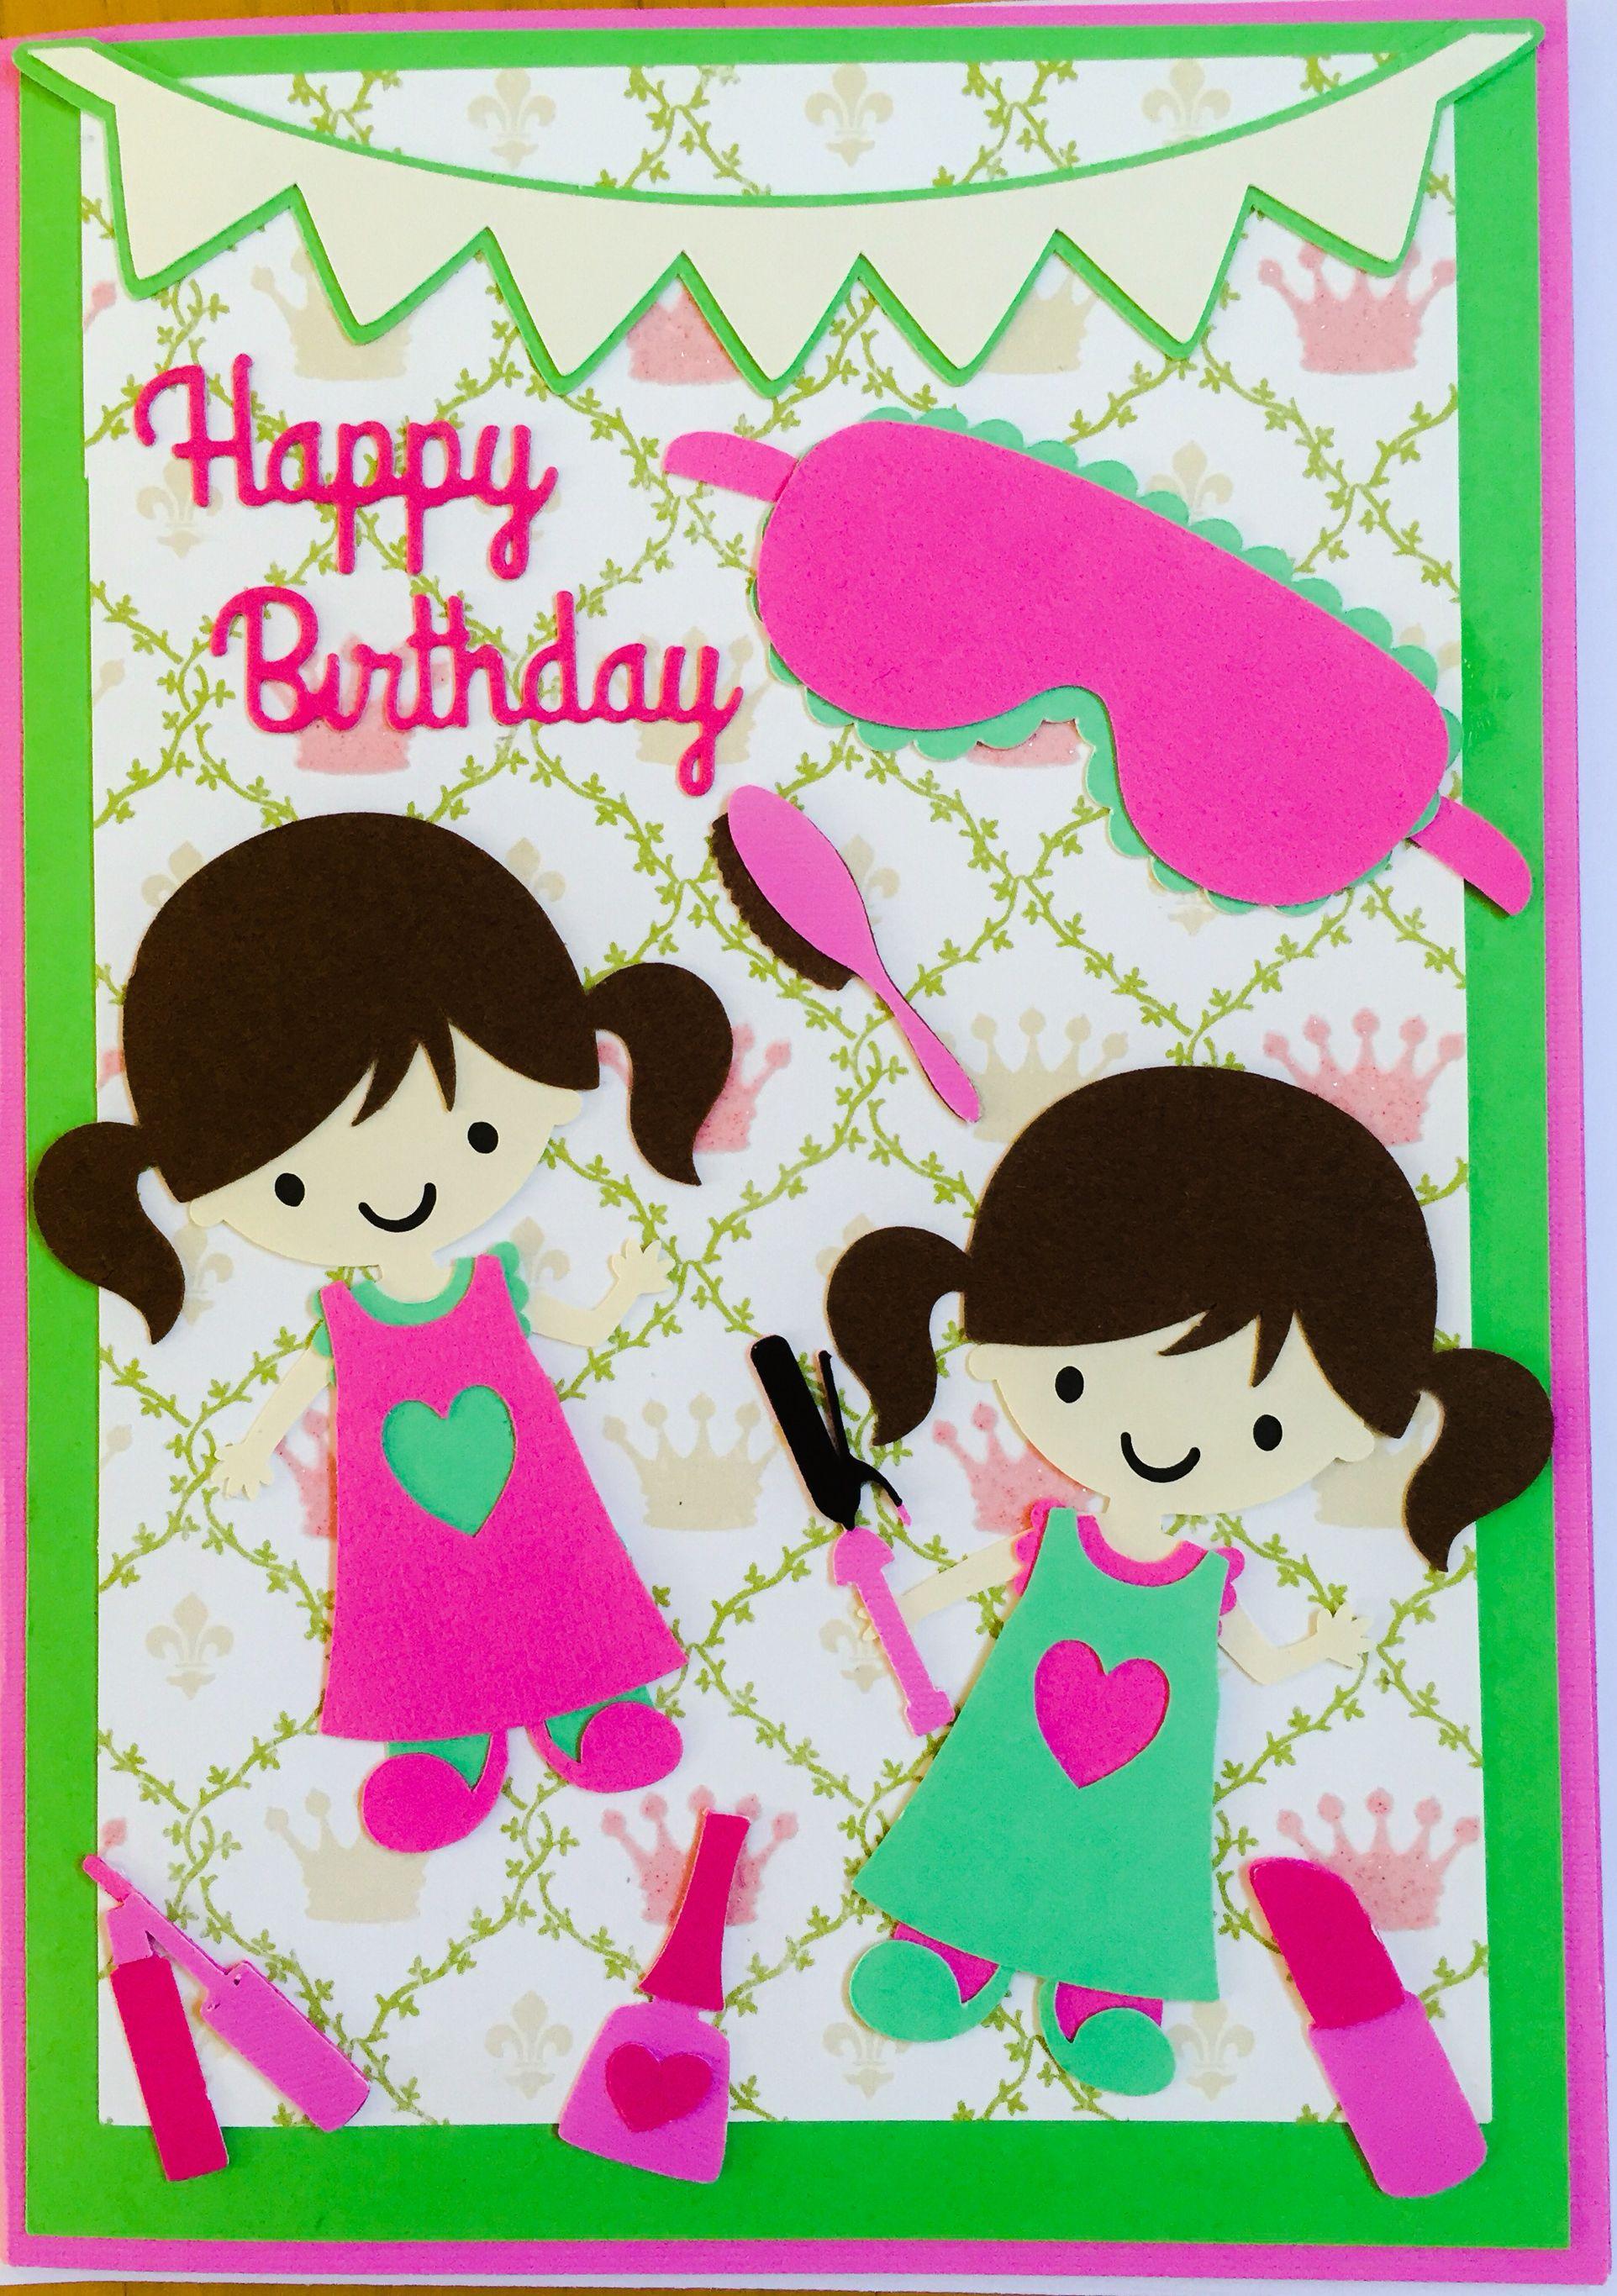 Homemade kidsgirl birthday card using cricut everyday paper dolls